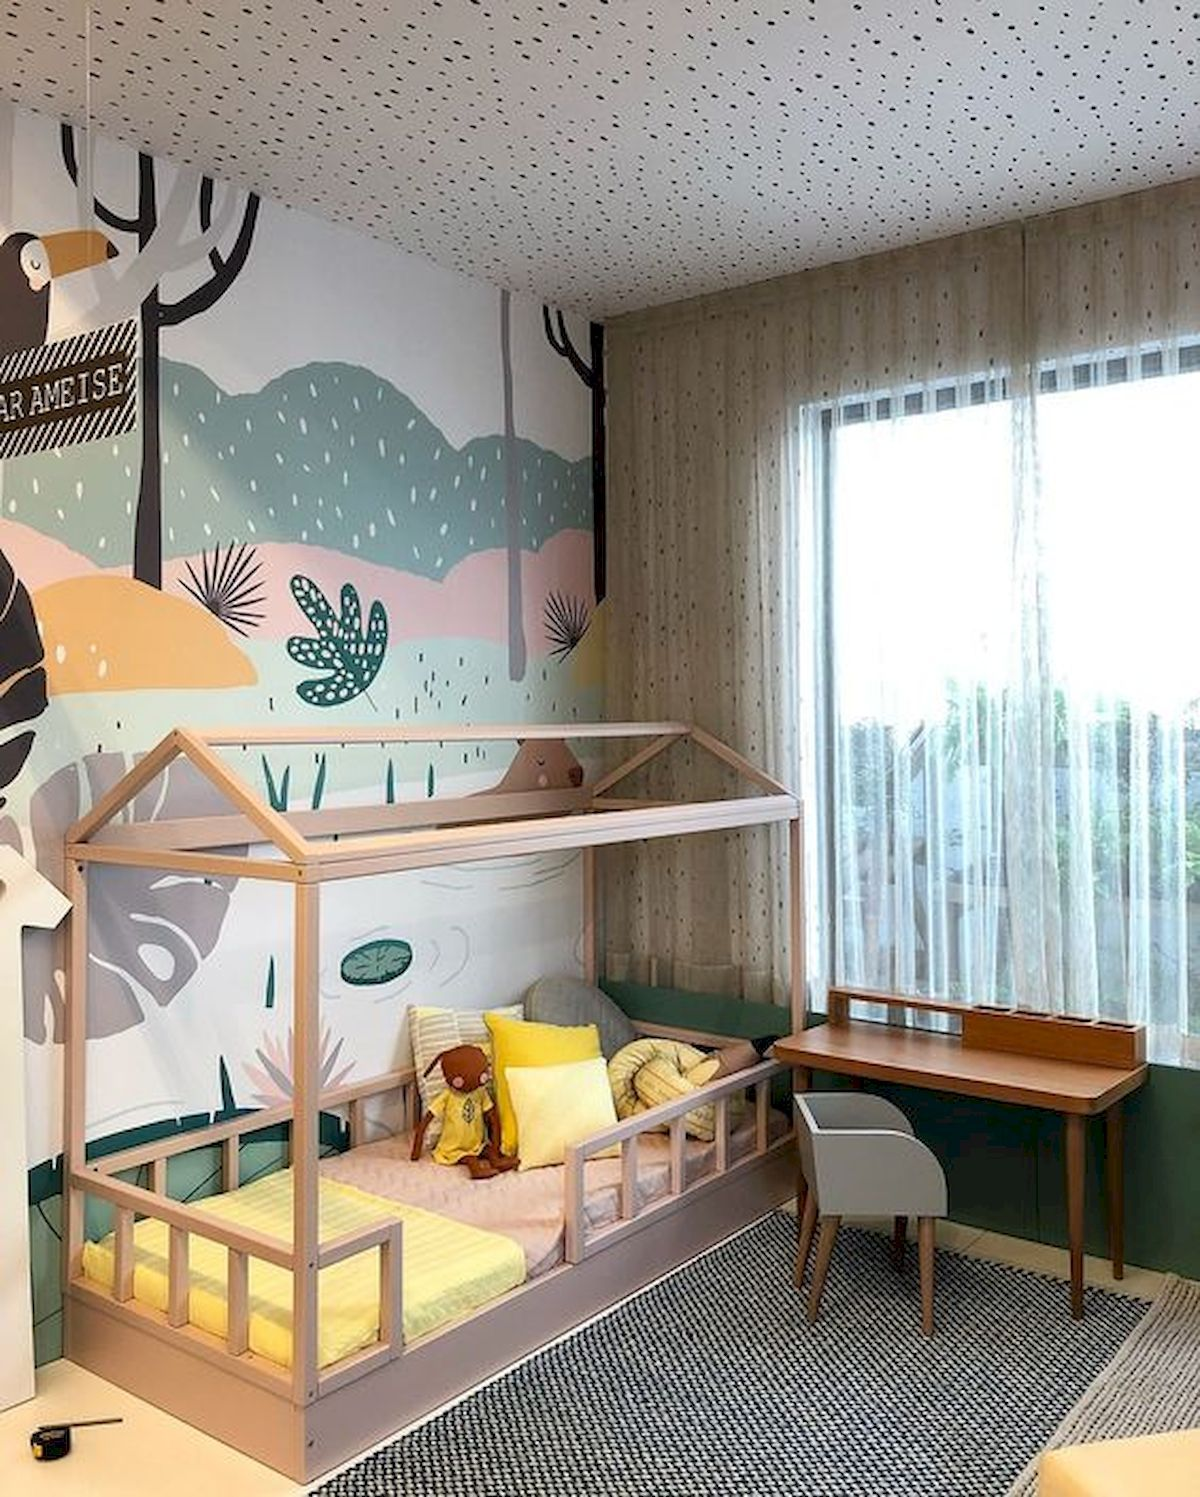 Adorable Nursery Idea: 40 Adorable Nursery Room Ideas For Baby Boy